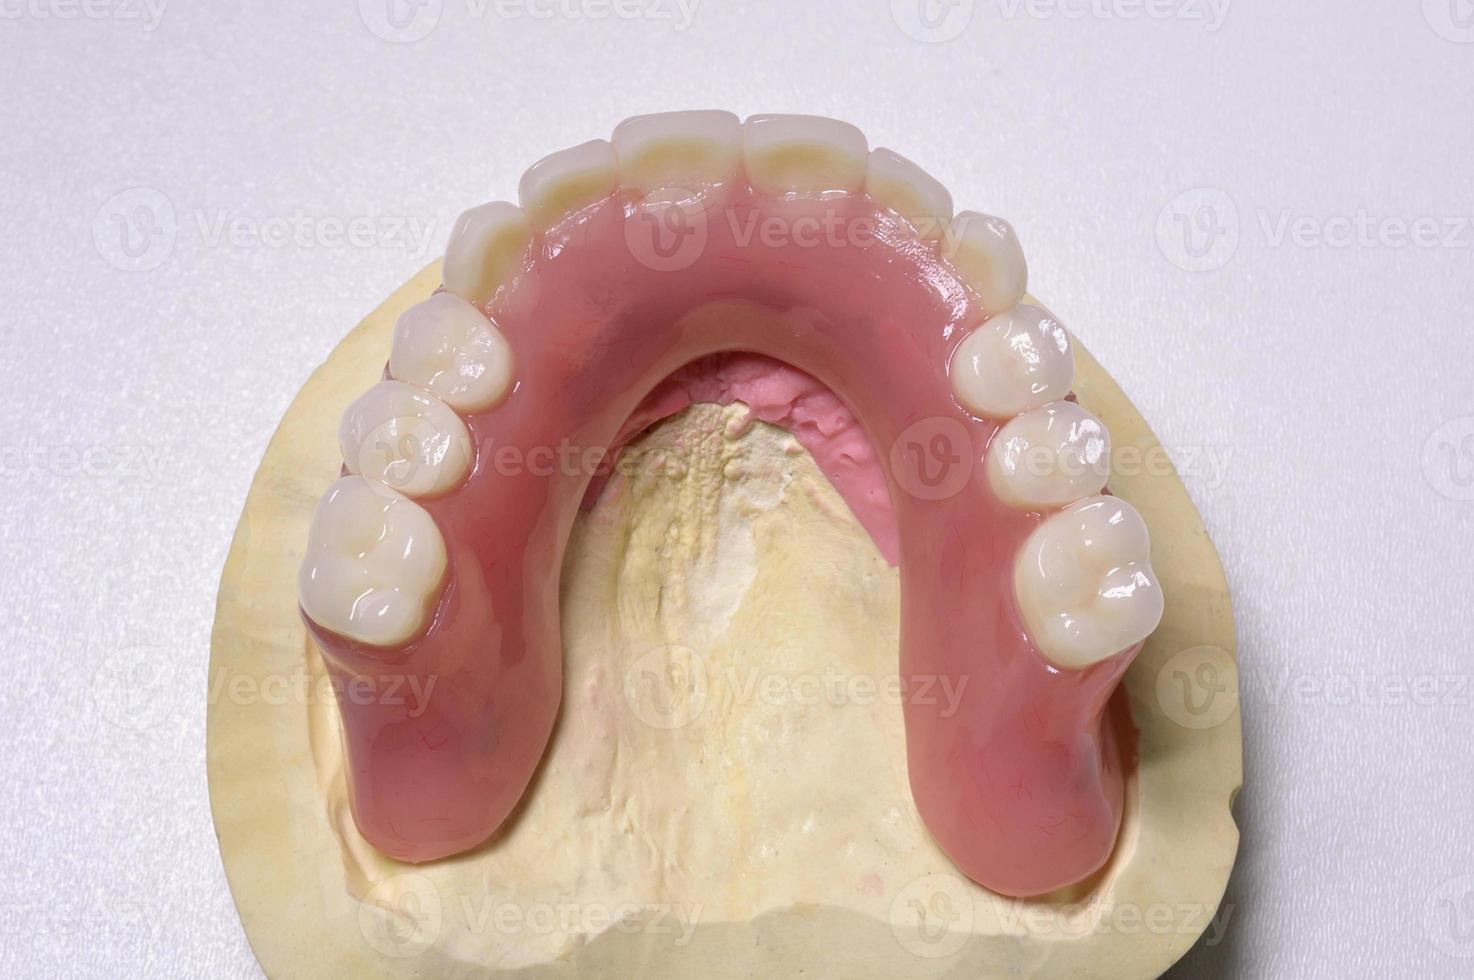 Zahnprothese foto